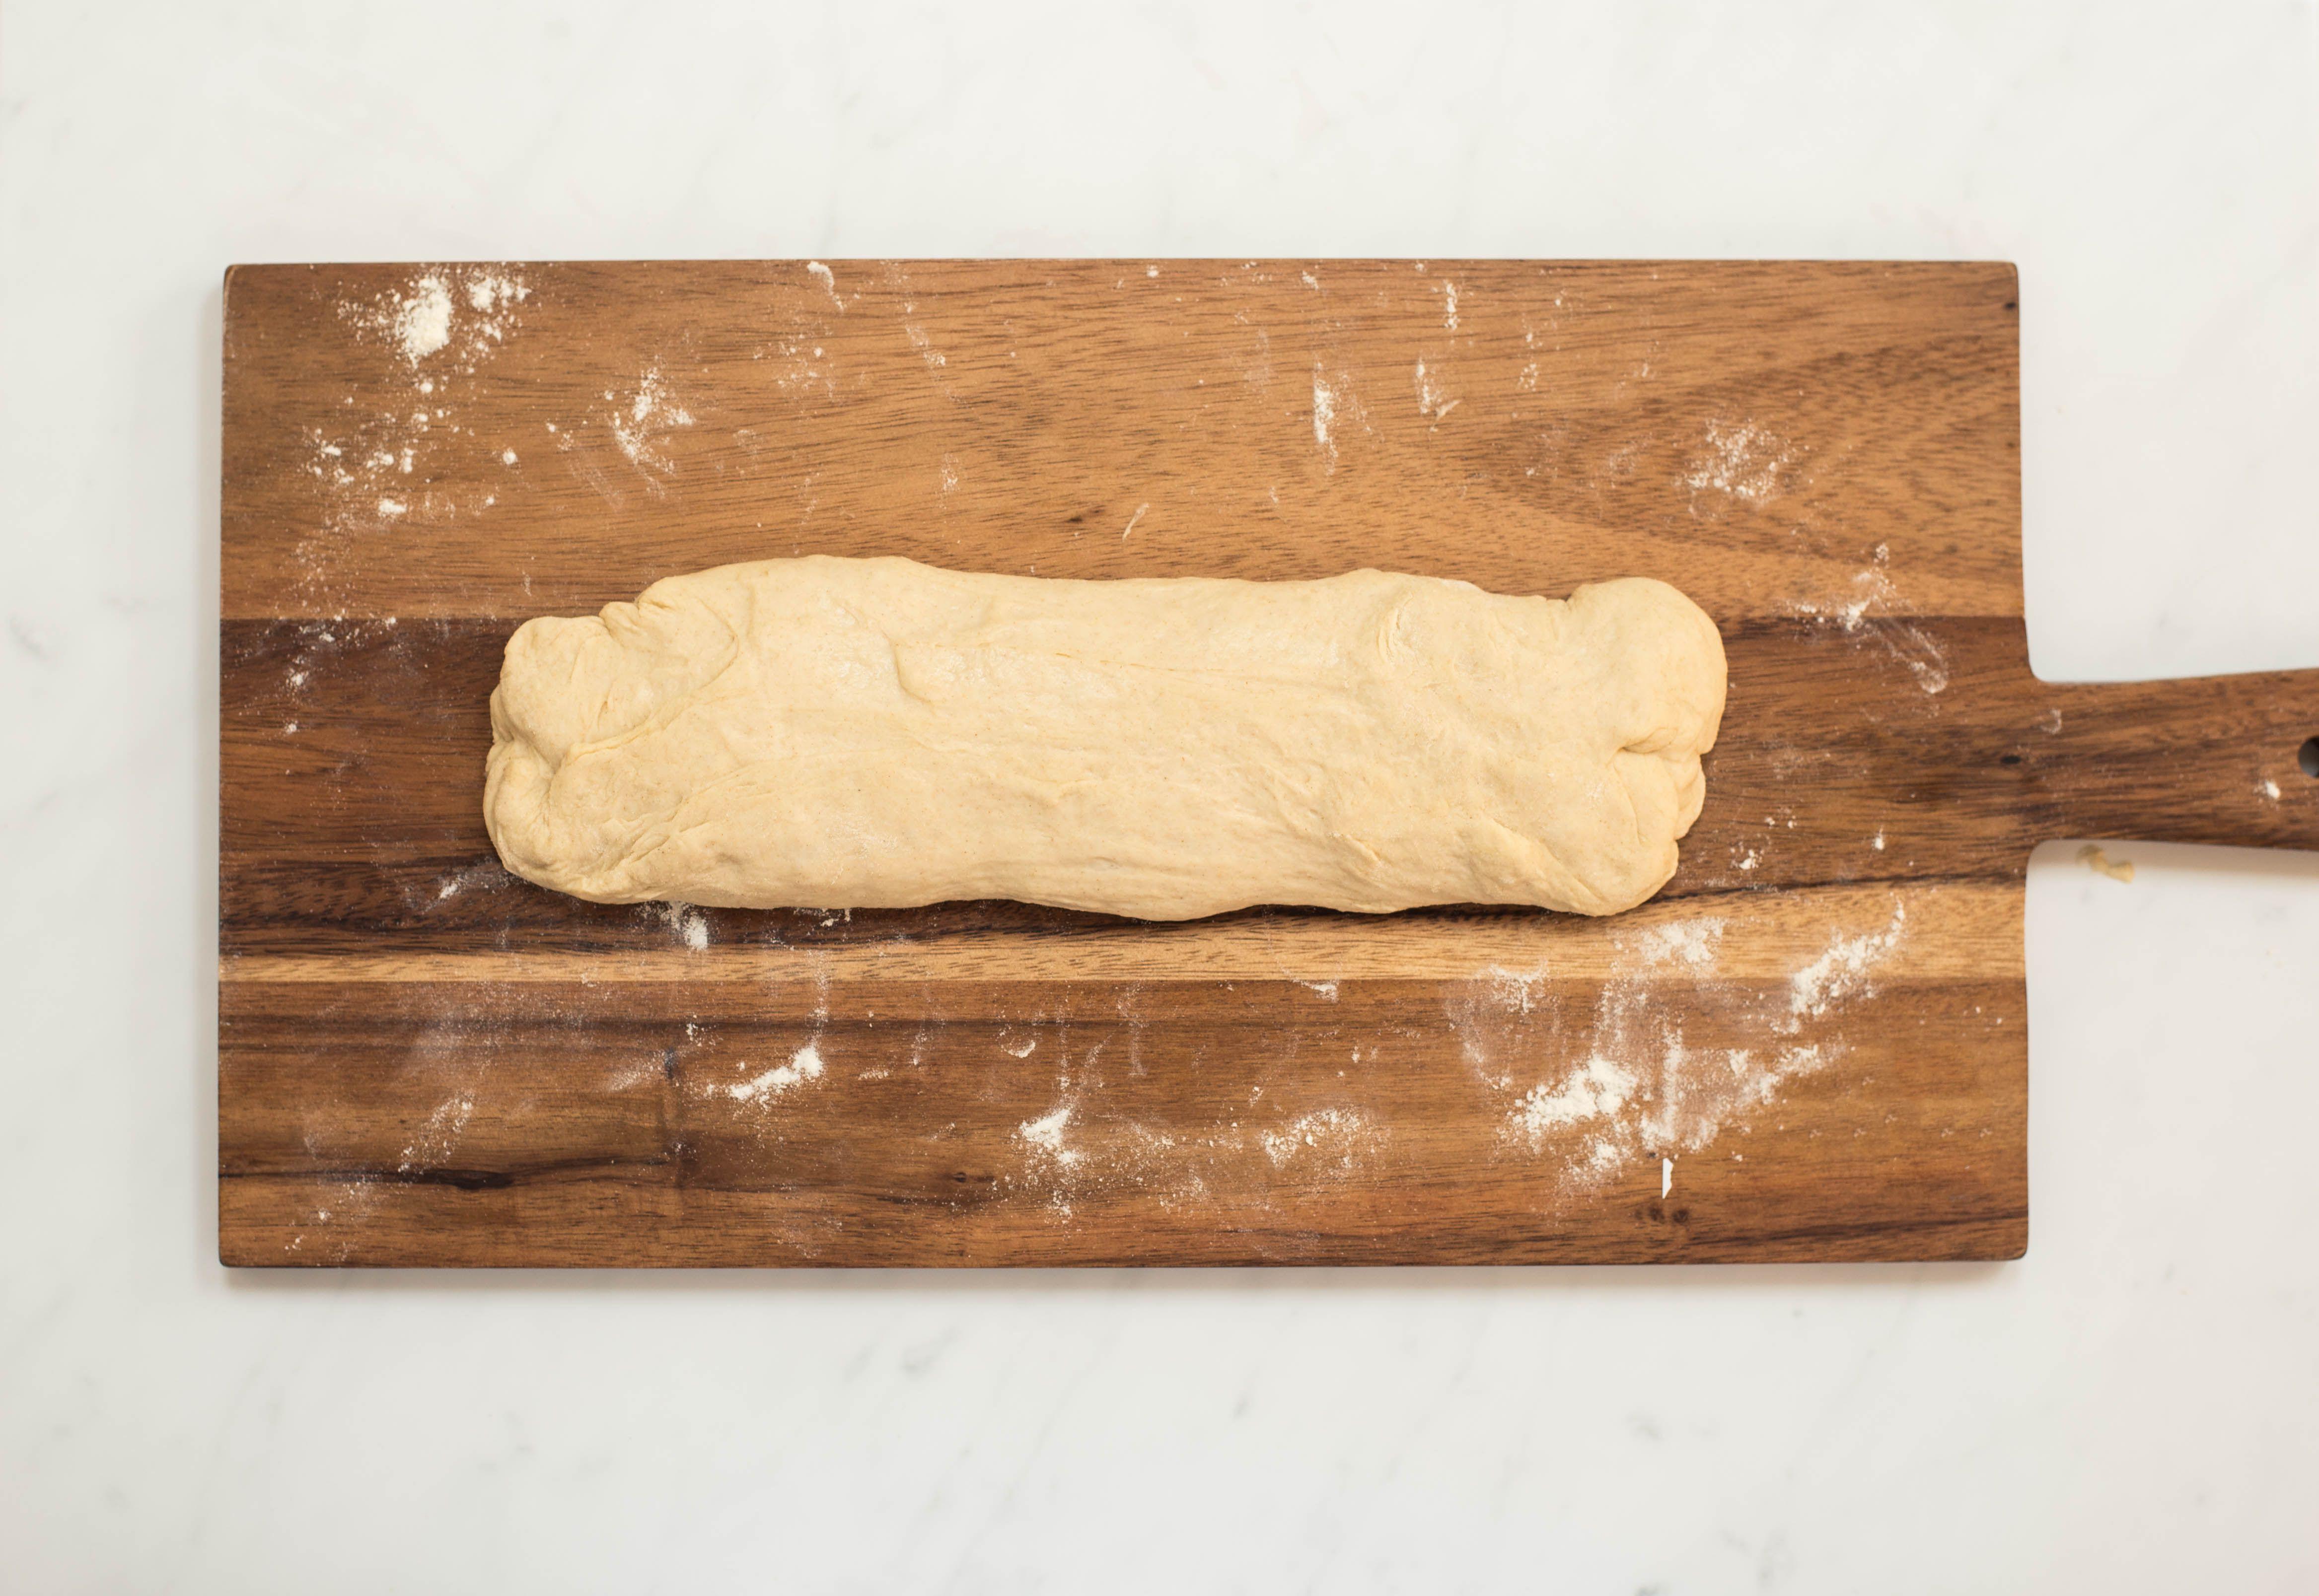 Knead dough